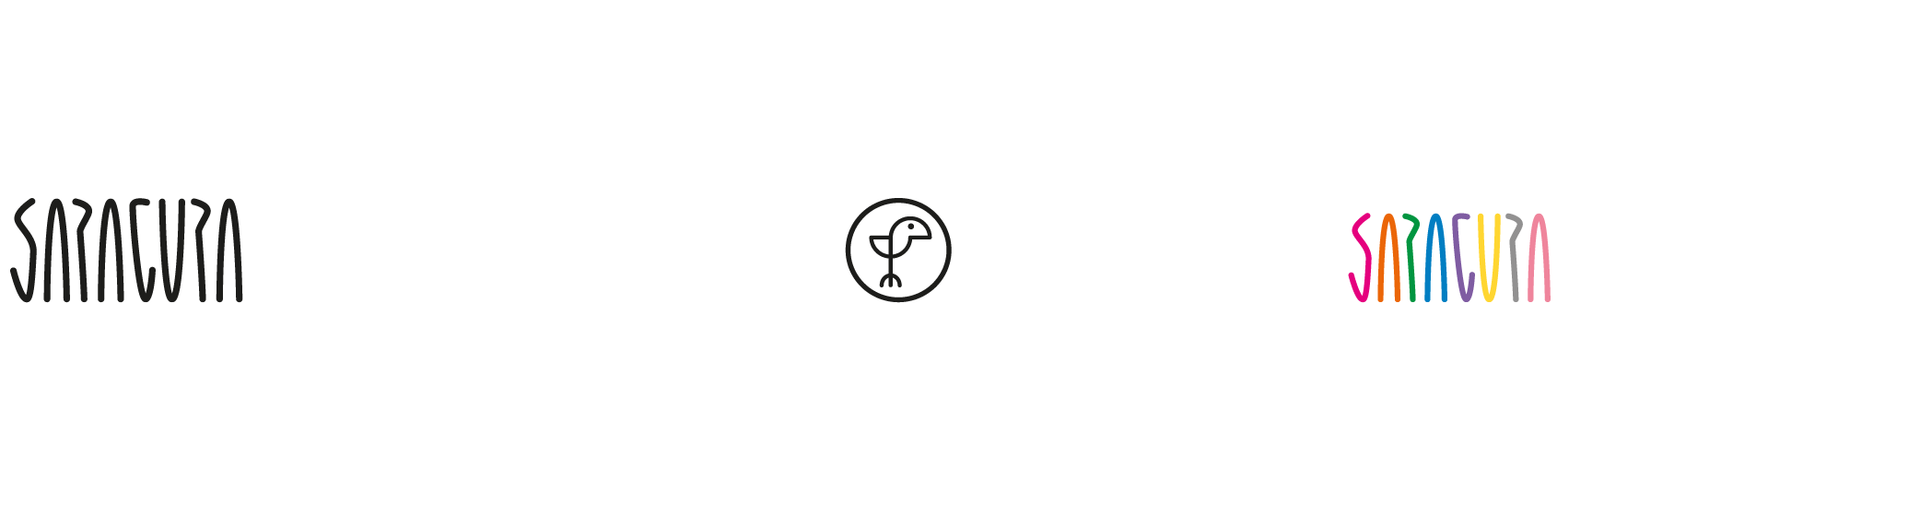 apoc_studio_gustavo_francesconi_logos_60